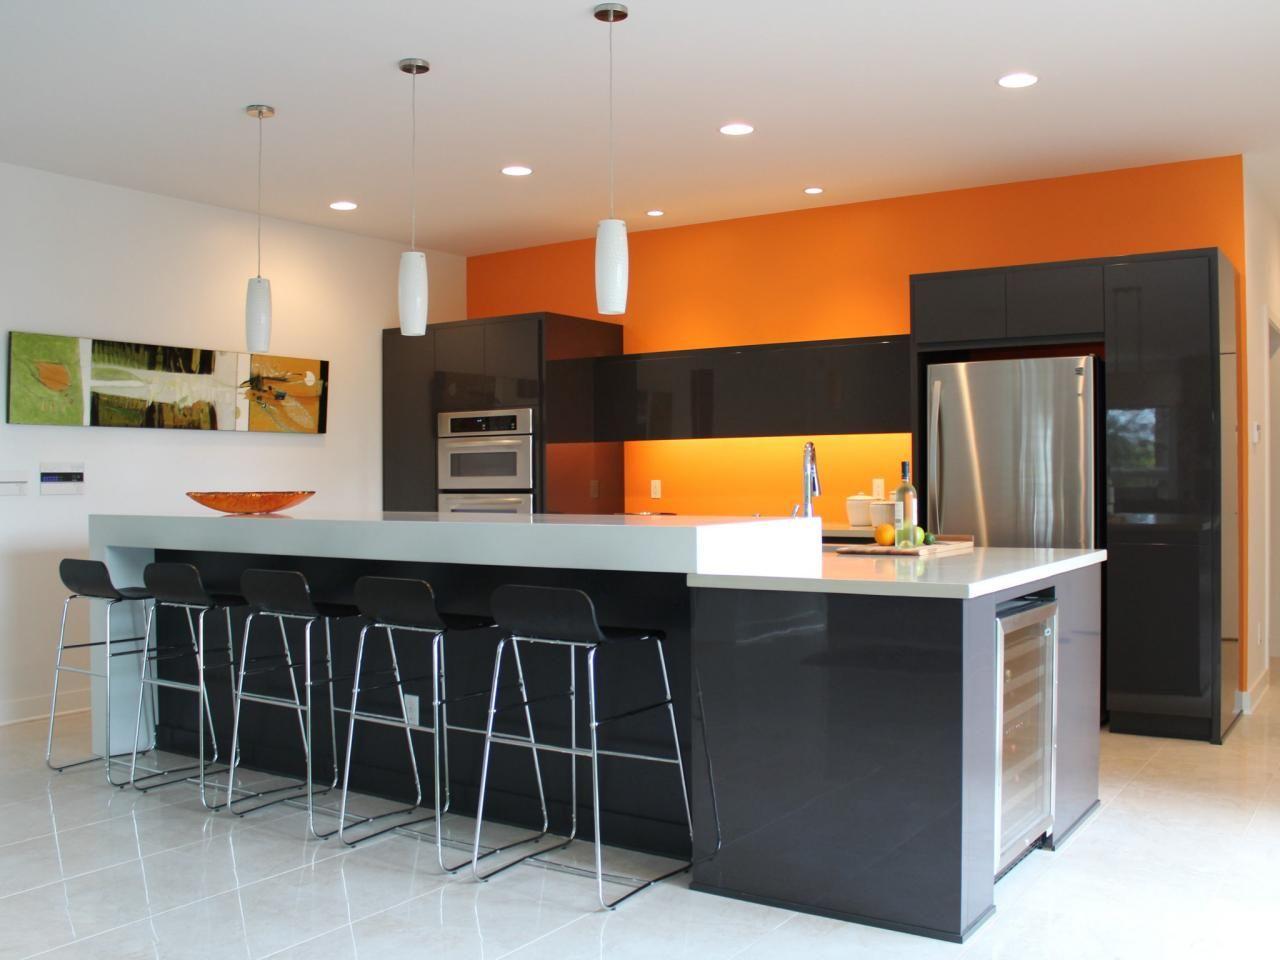 • The World S Catalog Of Ideas. Open Shelves In Kitchen Ideas. 25 Open Kitchen Shelving Kitchen. Ideas On Open Shelves in The Kitchen Http Homechanneltv